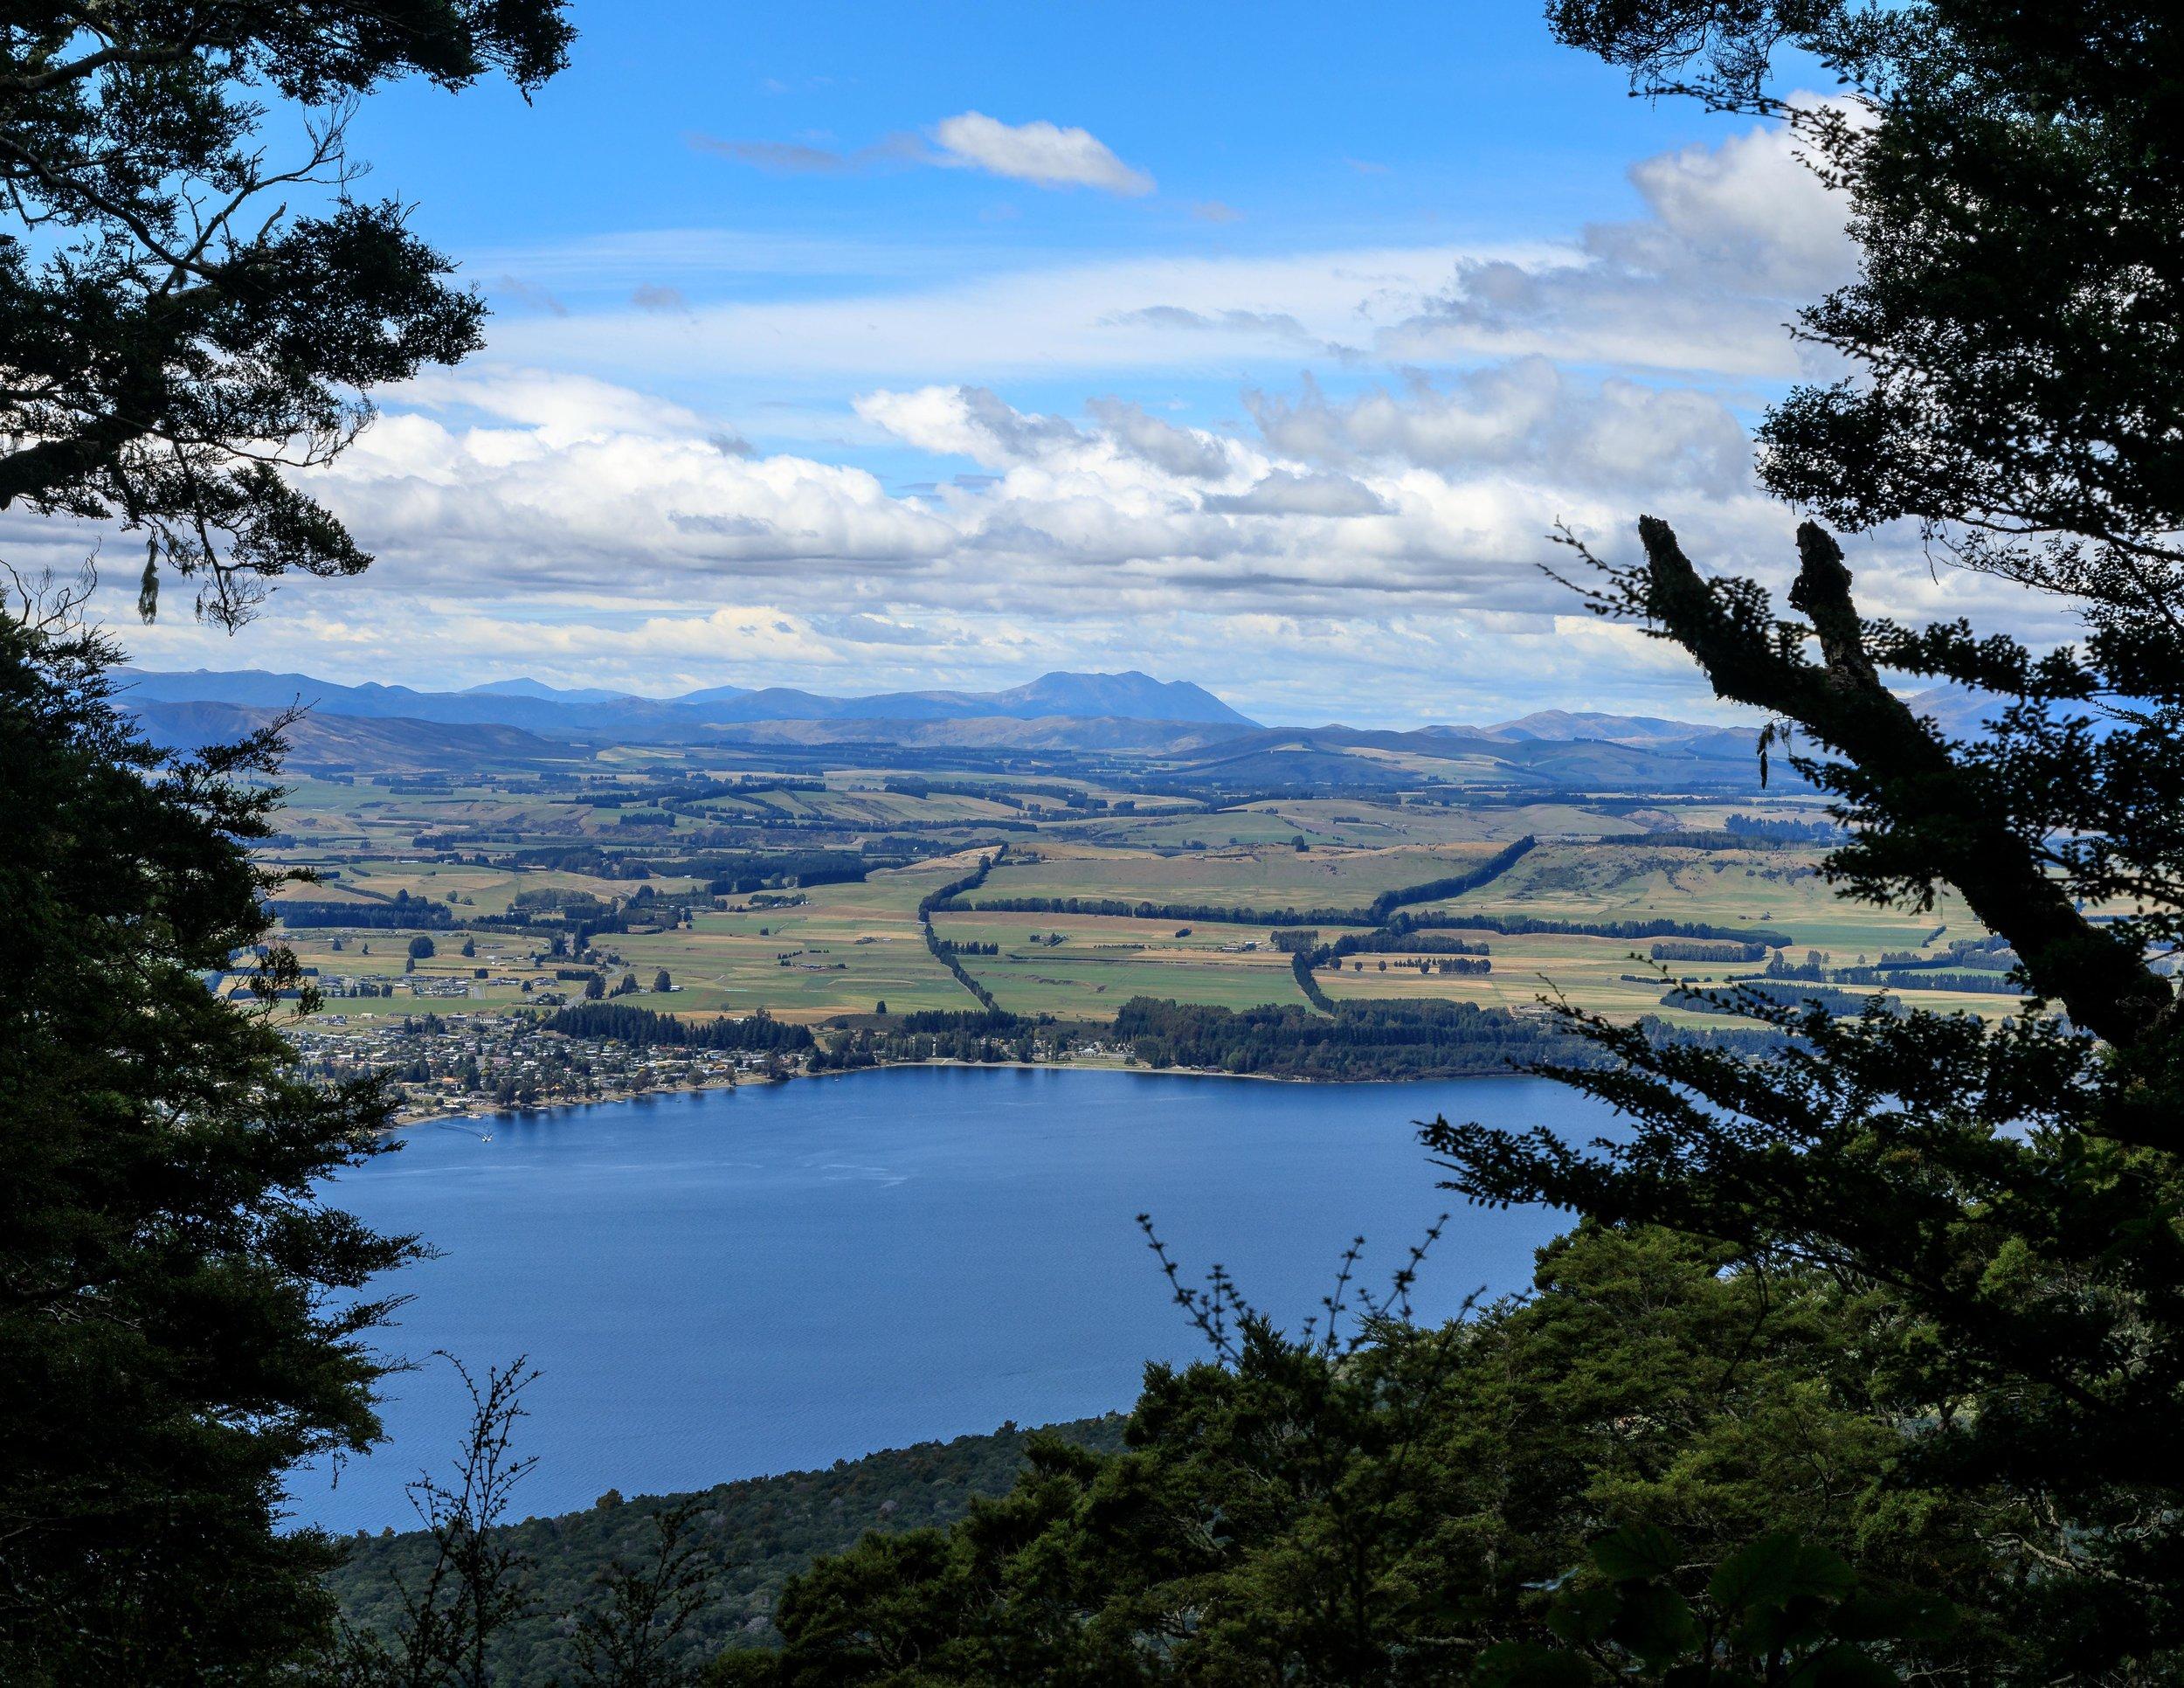 A glimpse of Lake Te Anau from the trail